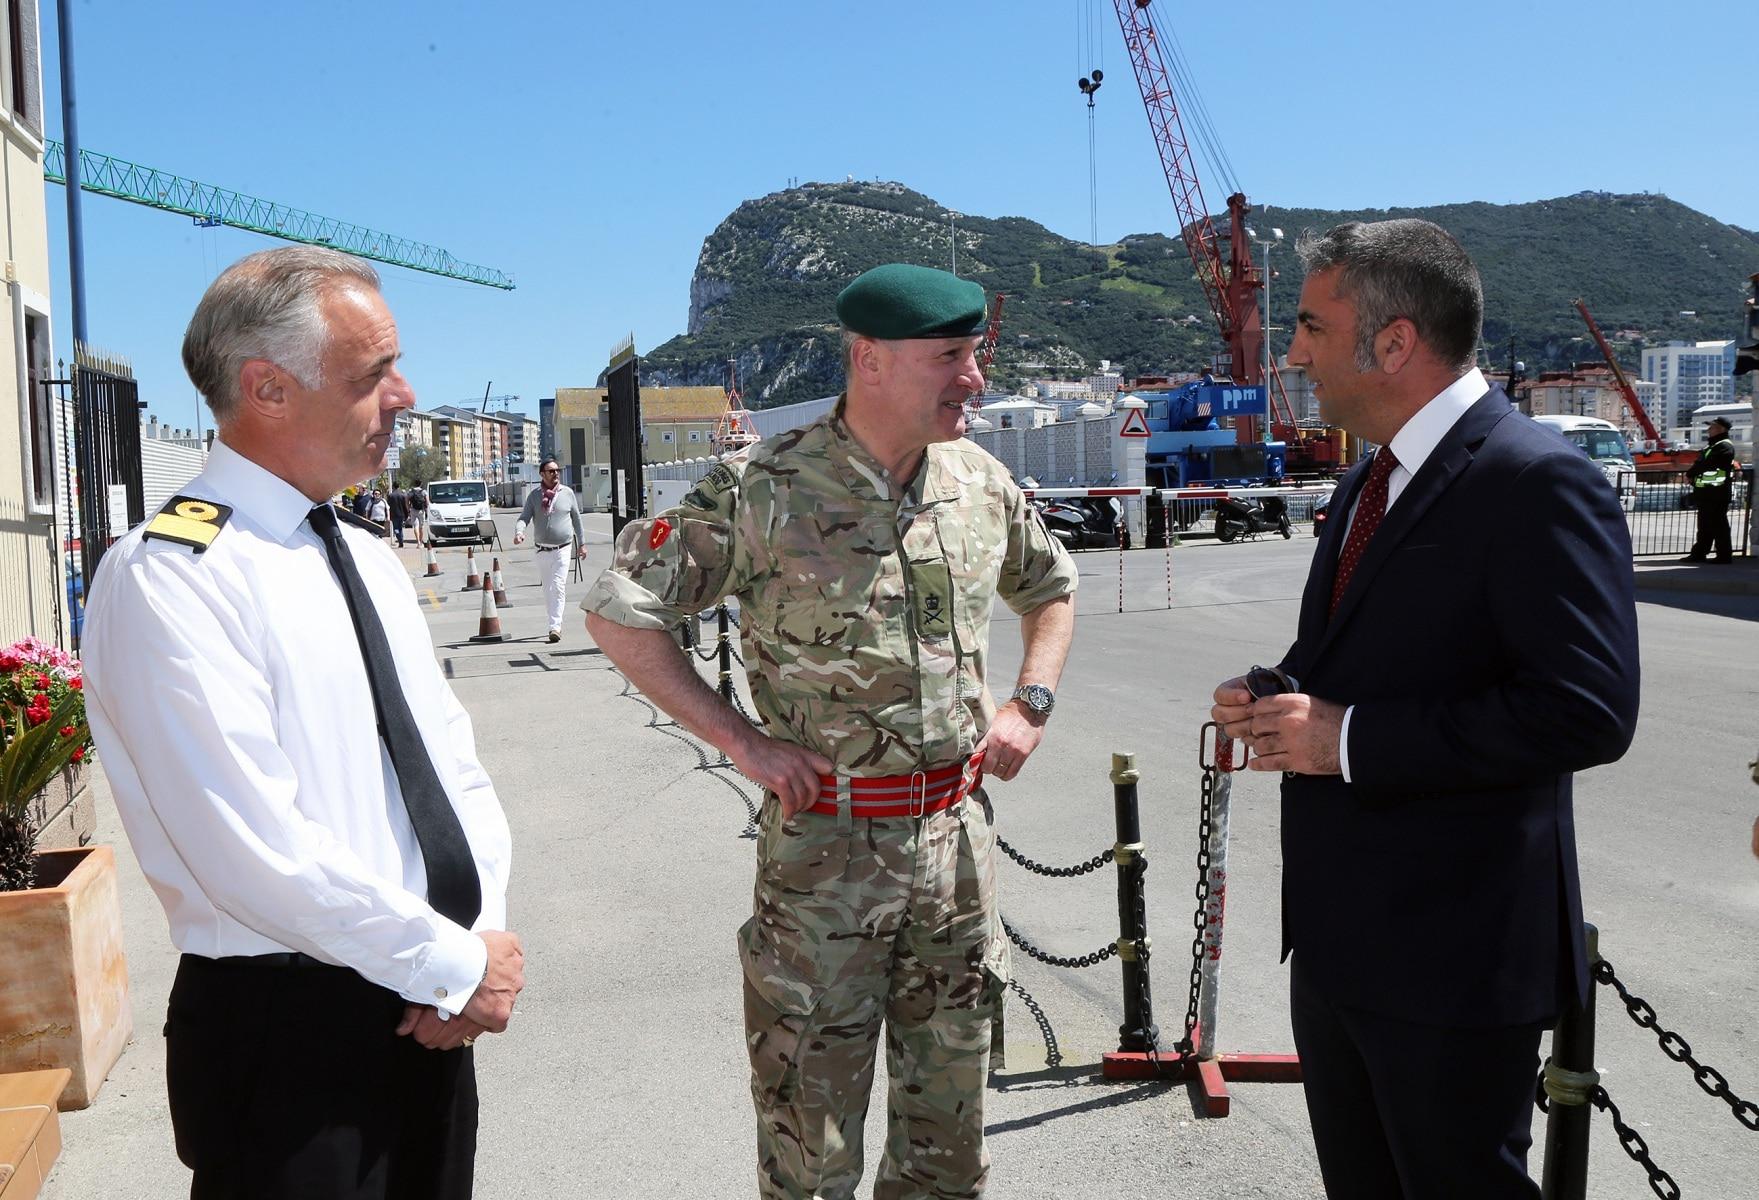 visita-oficial-del-gobernador-al-puerto-de-gibraltar_26062049432_o